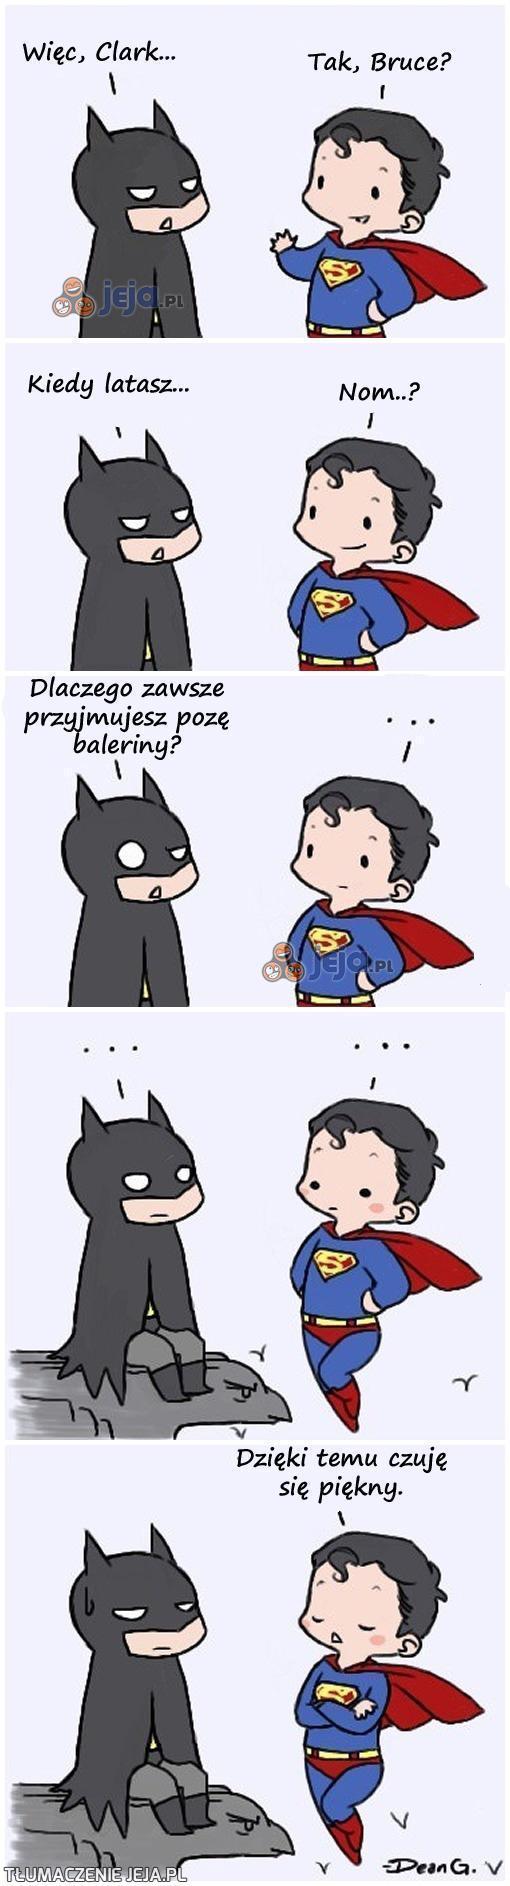 Superbalerina